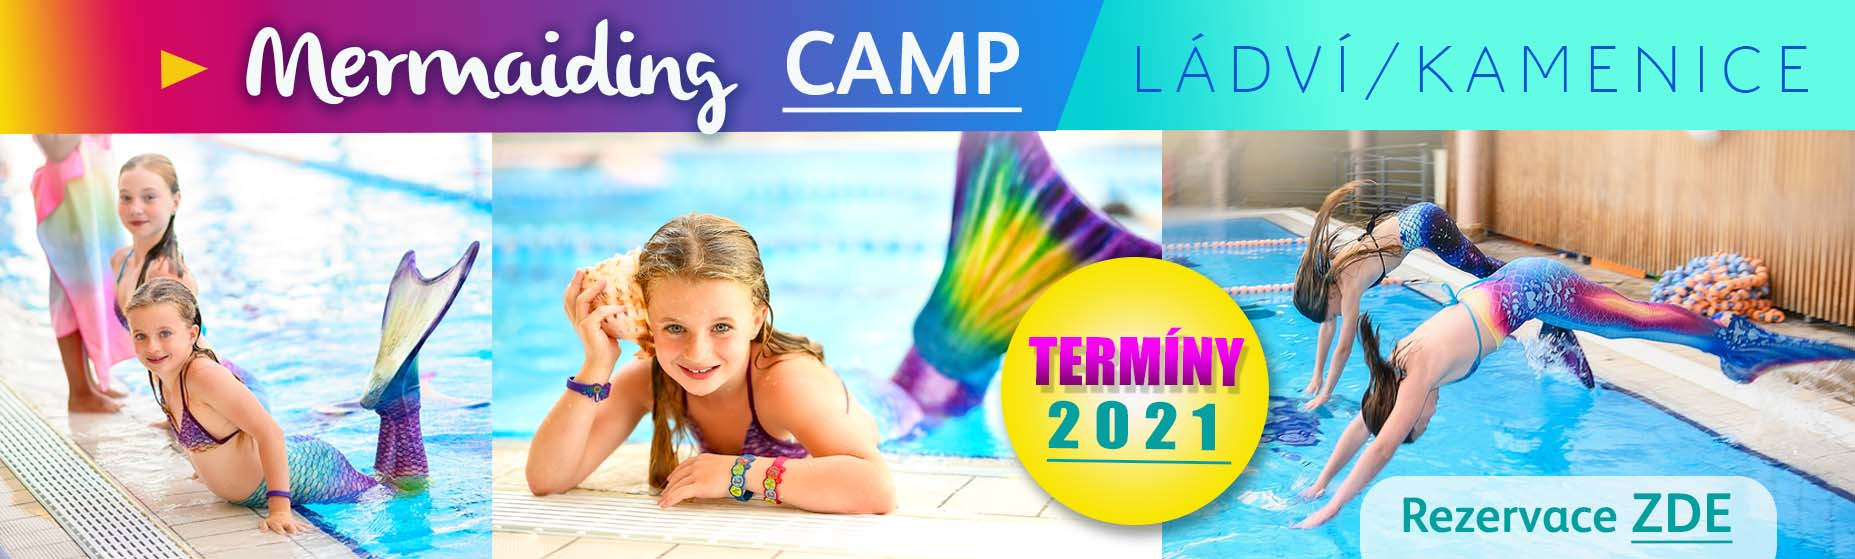 marmaiding_camp_2021